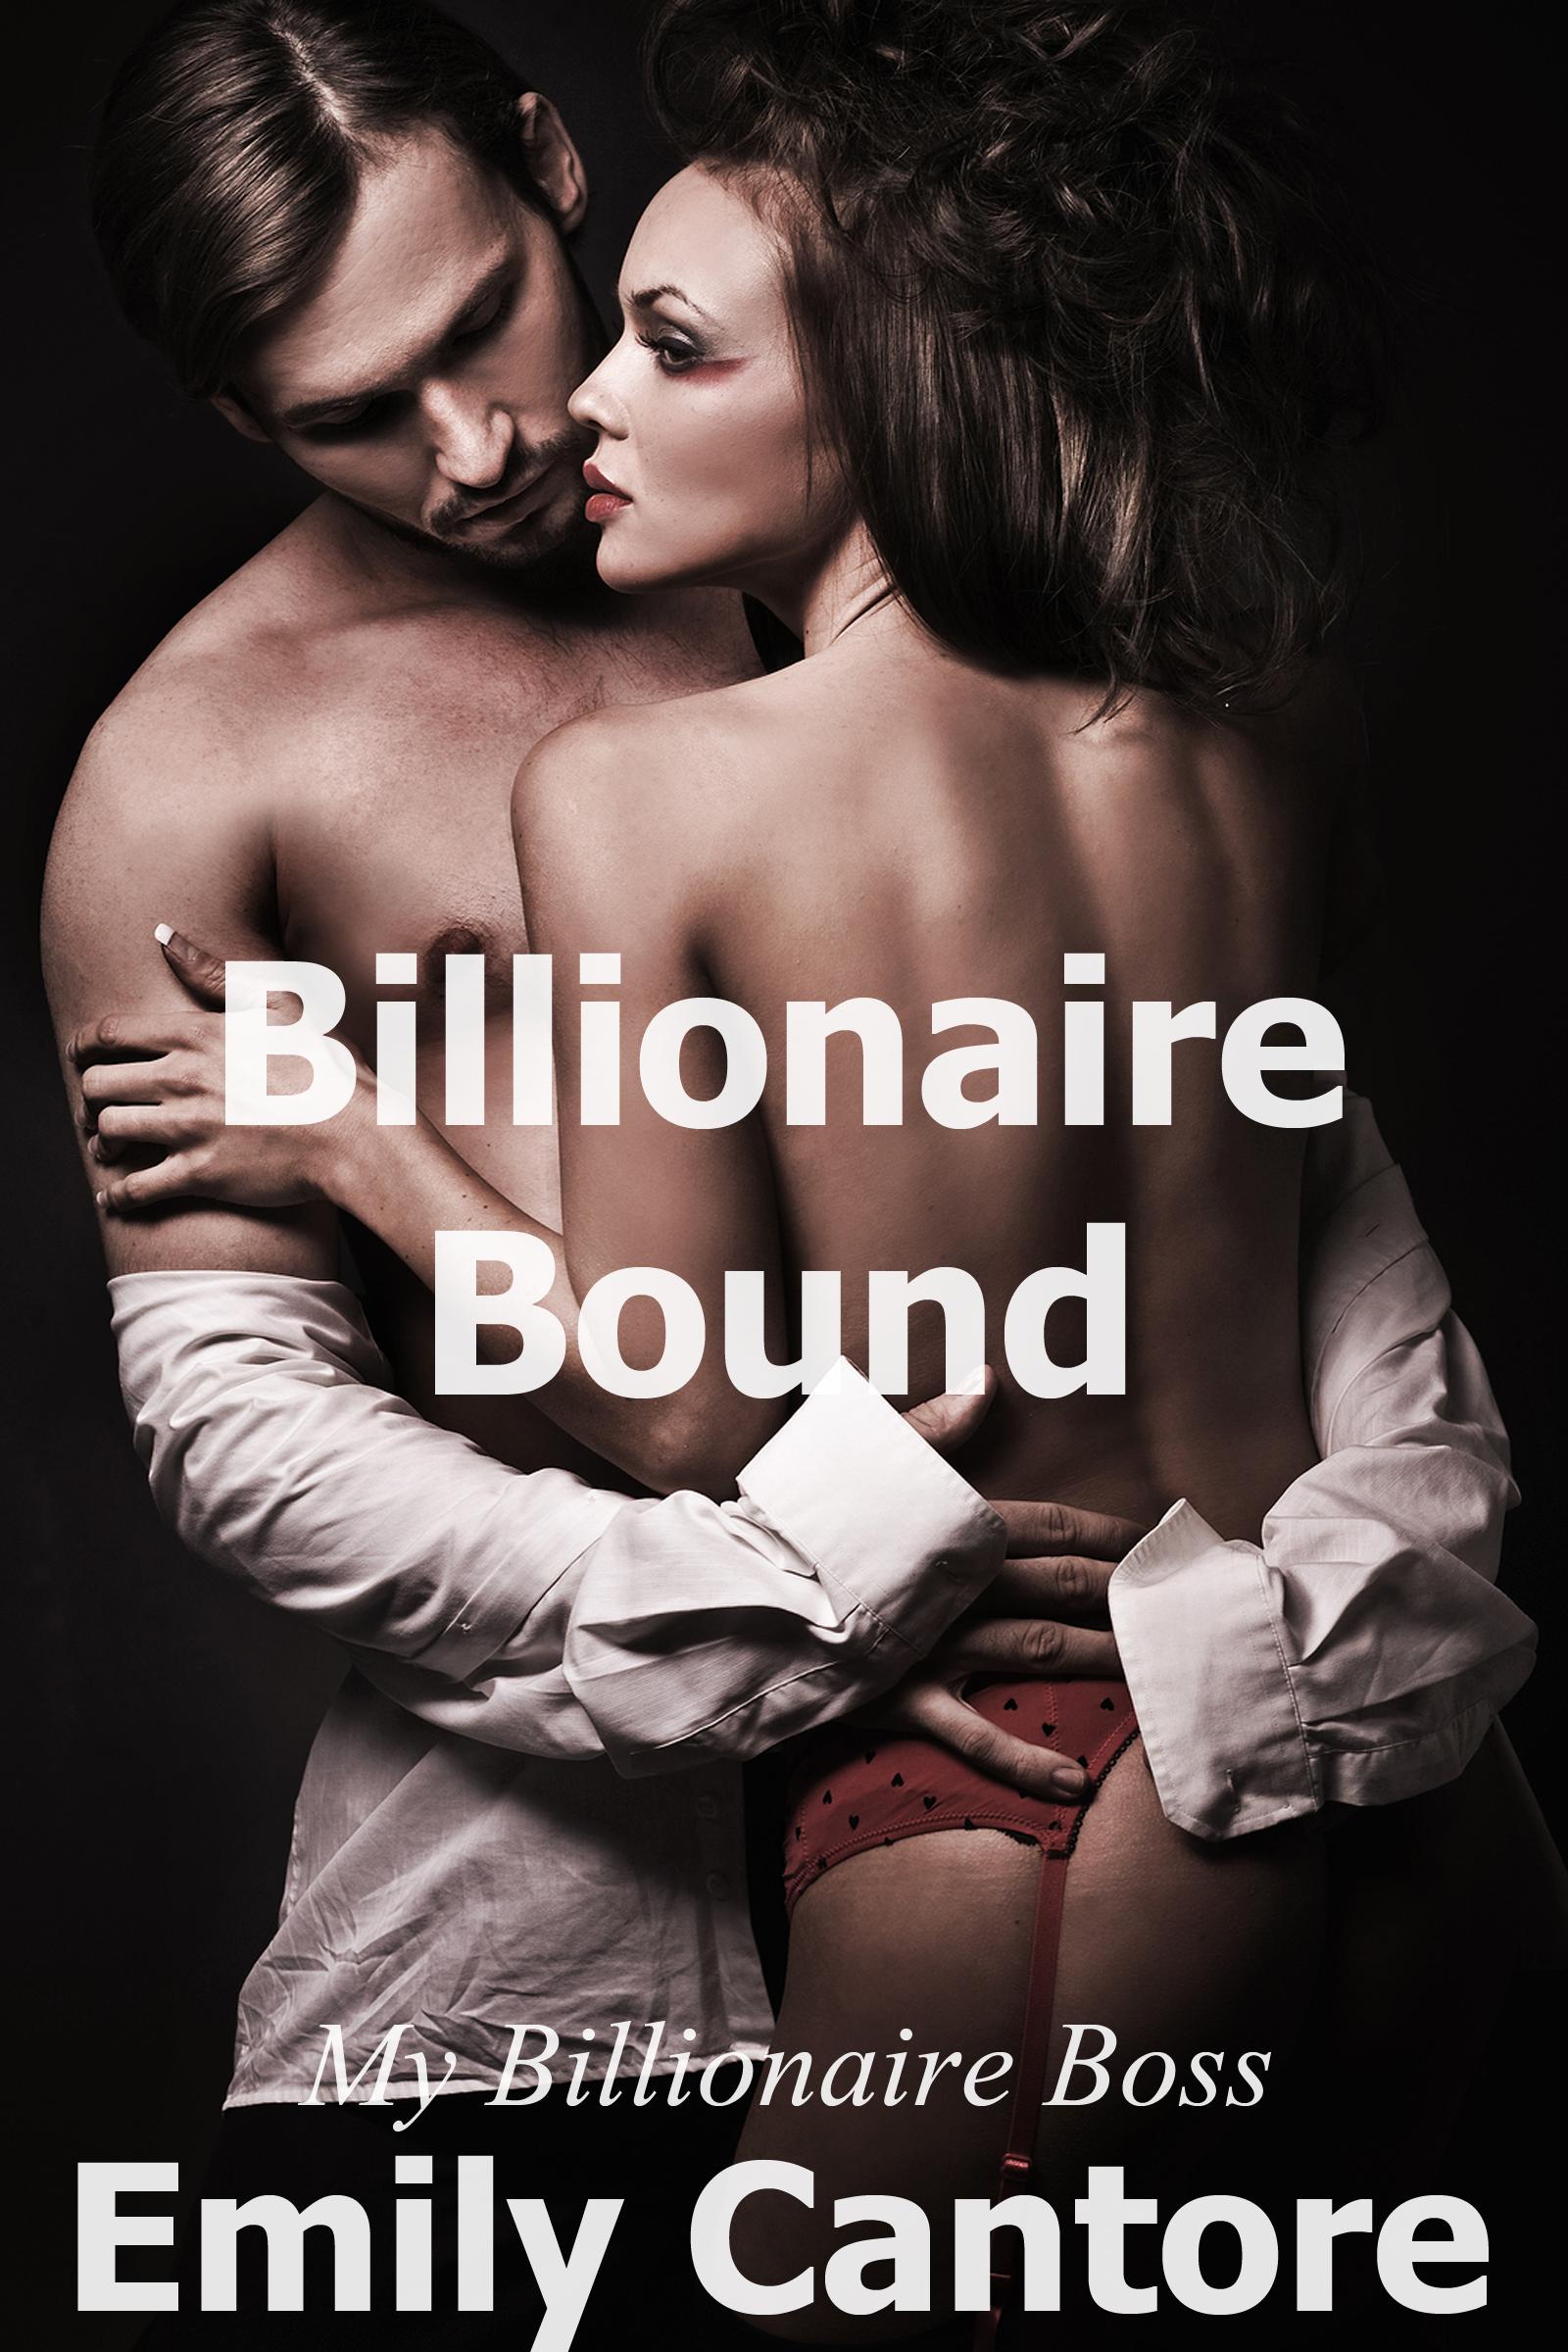 Catching Her Billionaire Boss (bondage, BDSM, spanking,)